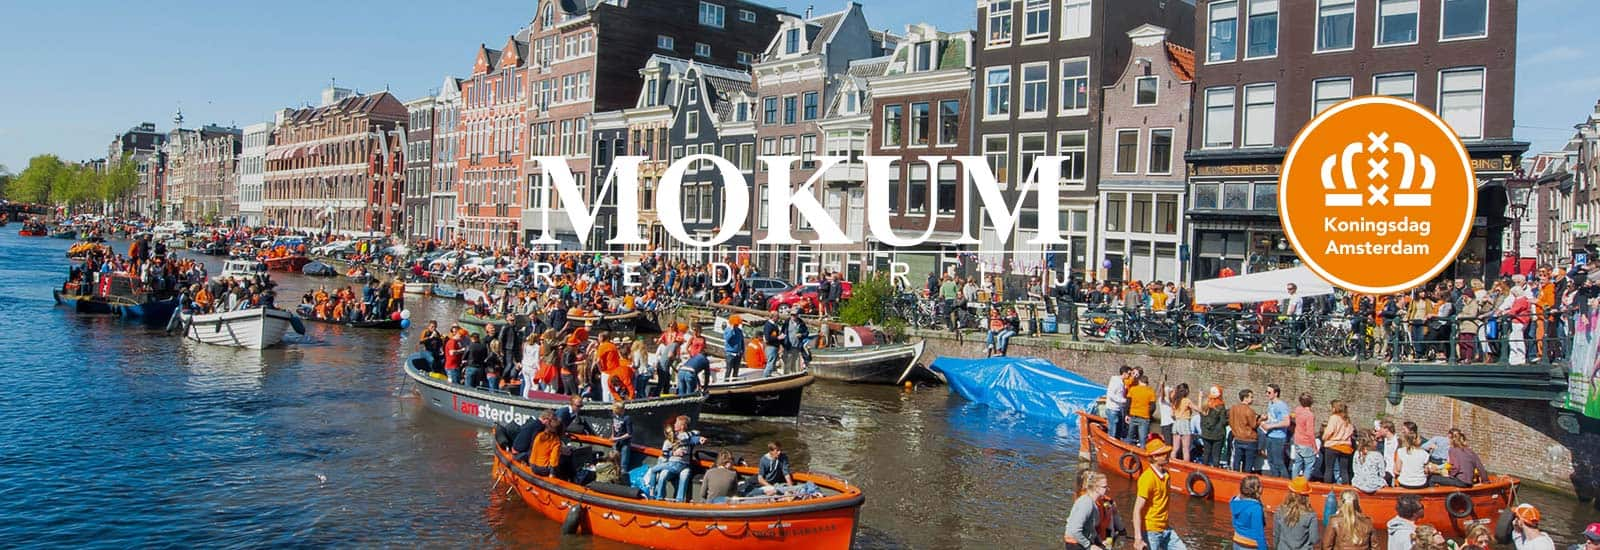 huur een boot koningsdag Amsterdam